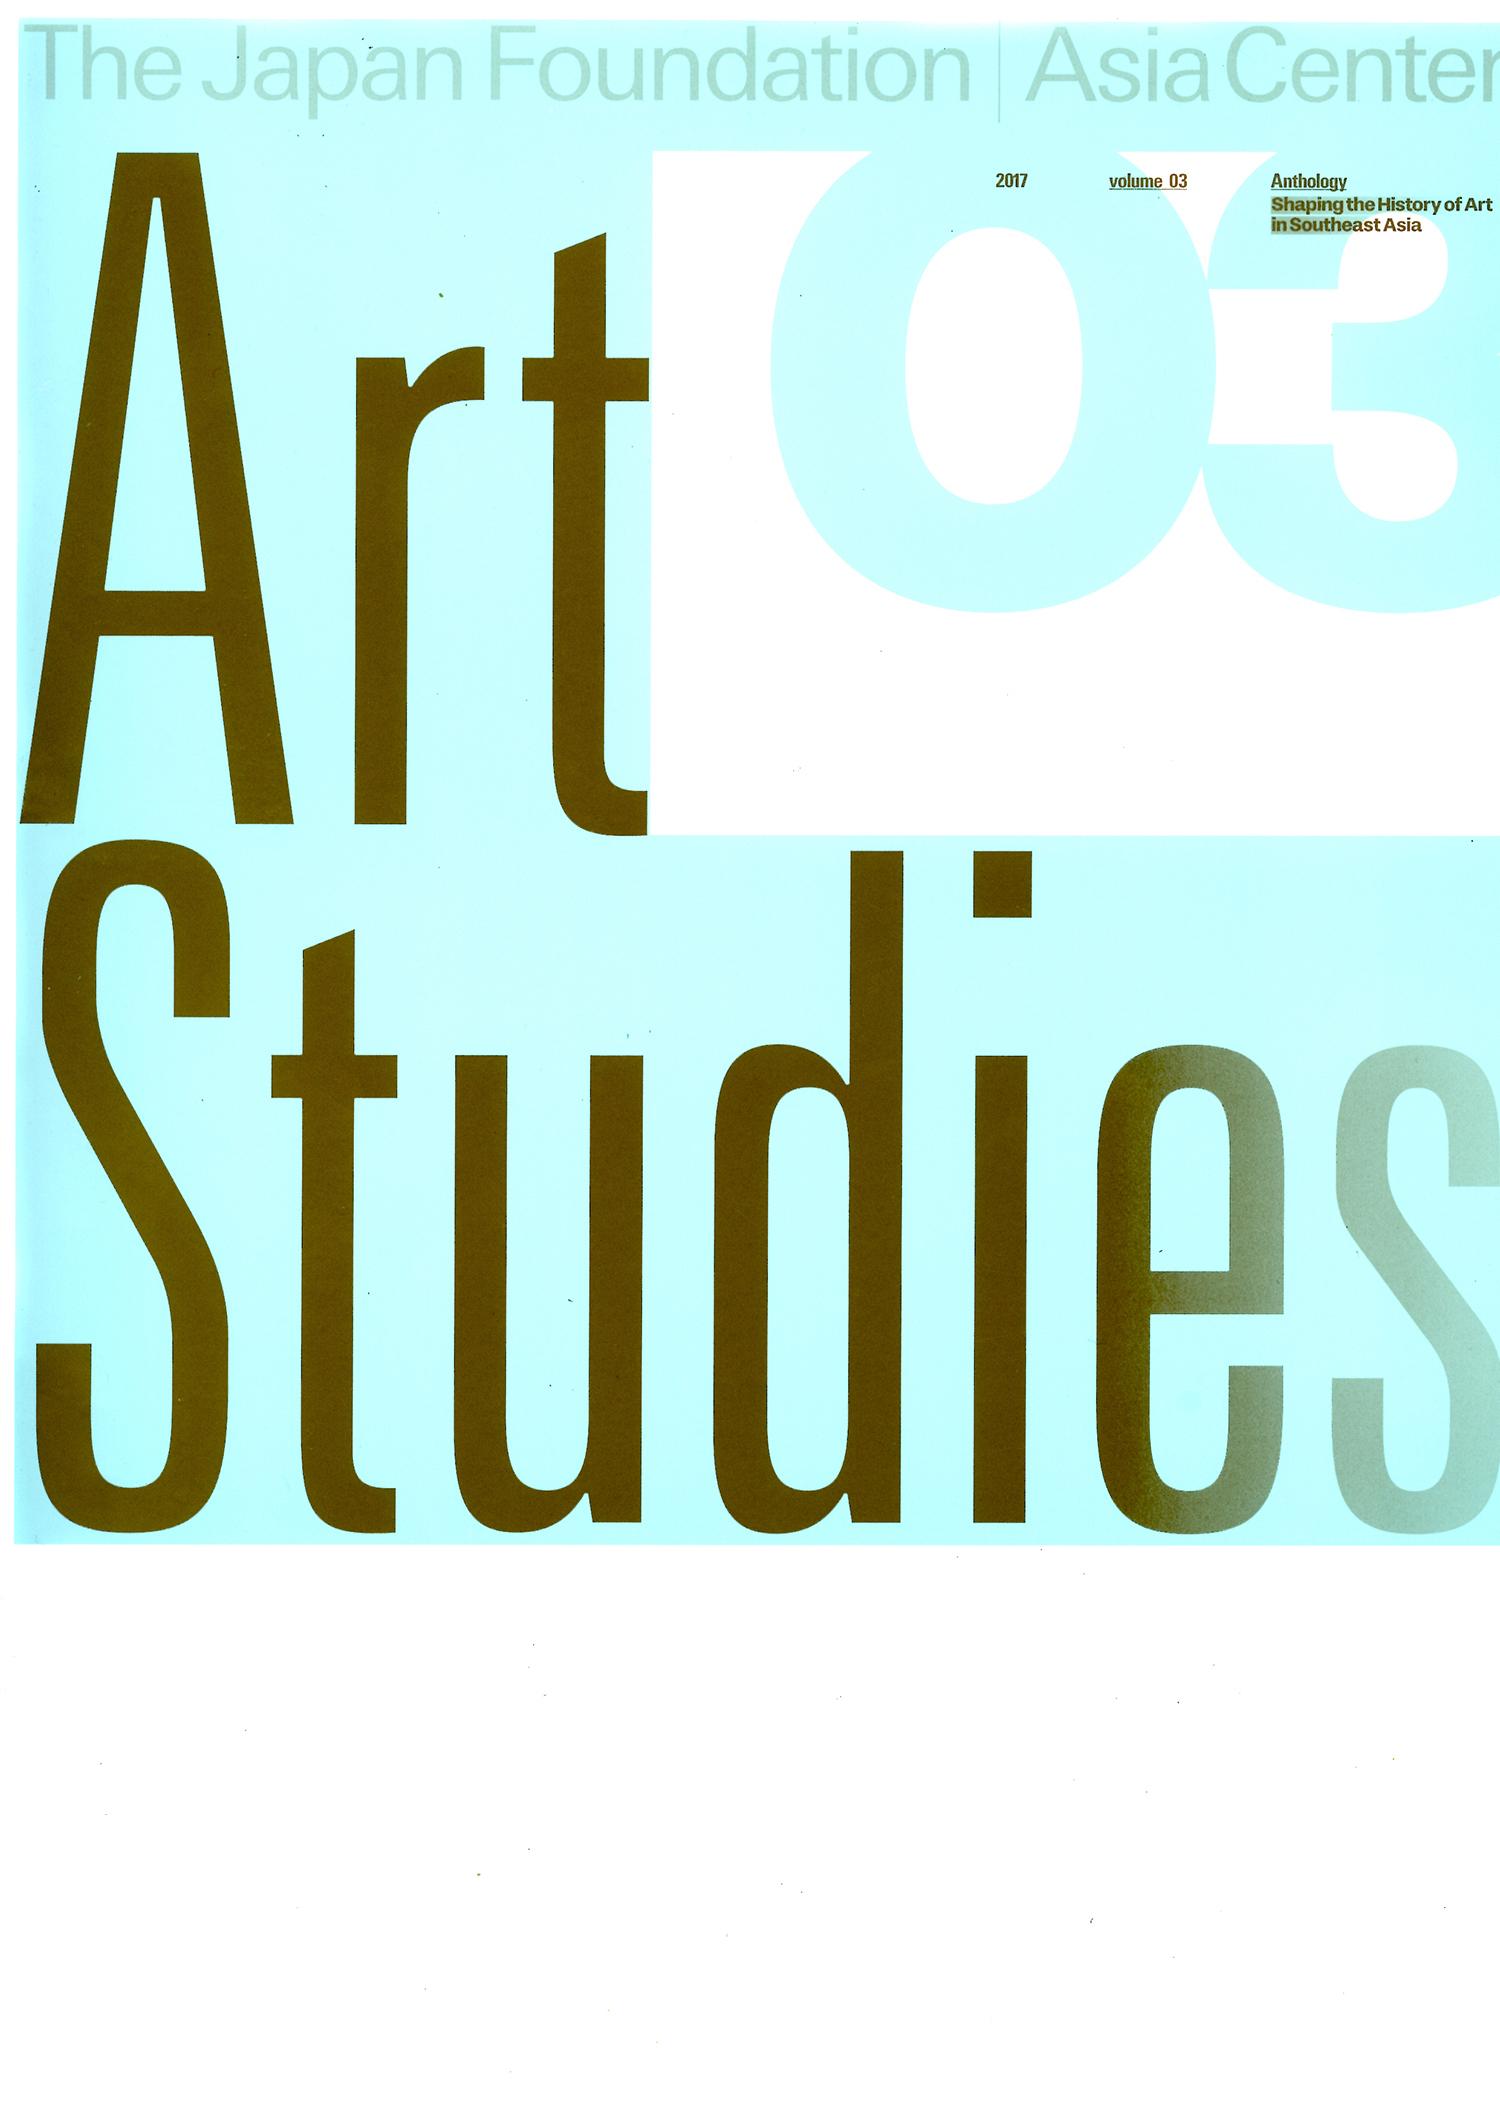 Julie_Ewington_0Art_studies_japan_foundation_coverLR.jpg